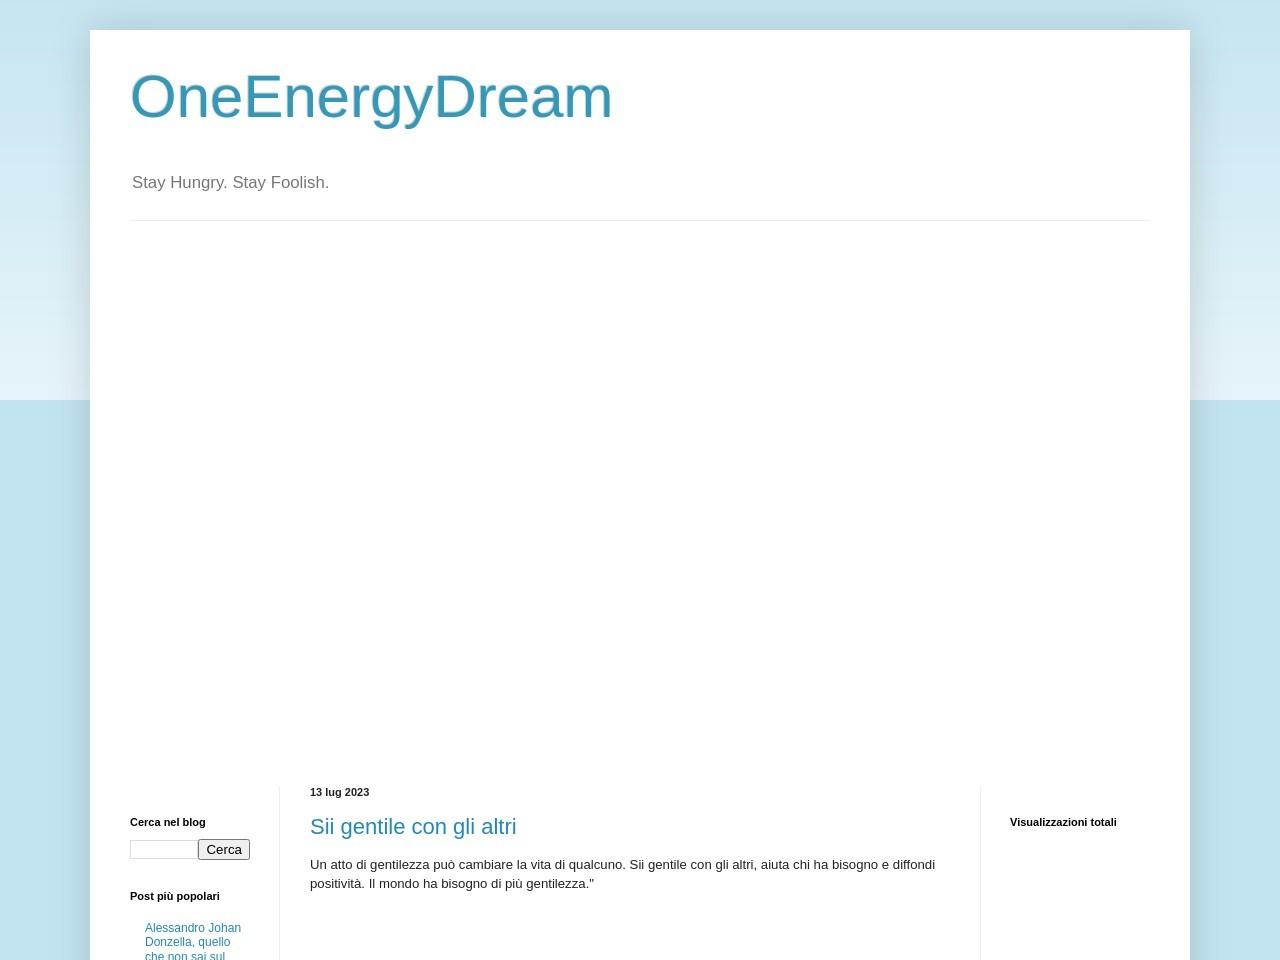 one-energy-dream-oneenergydream